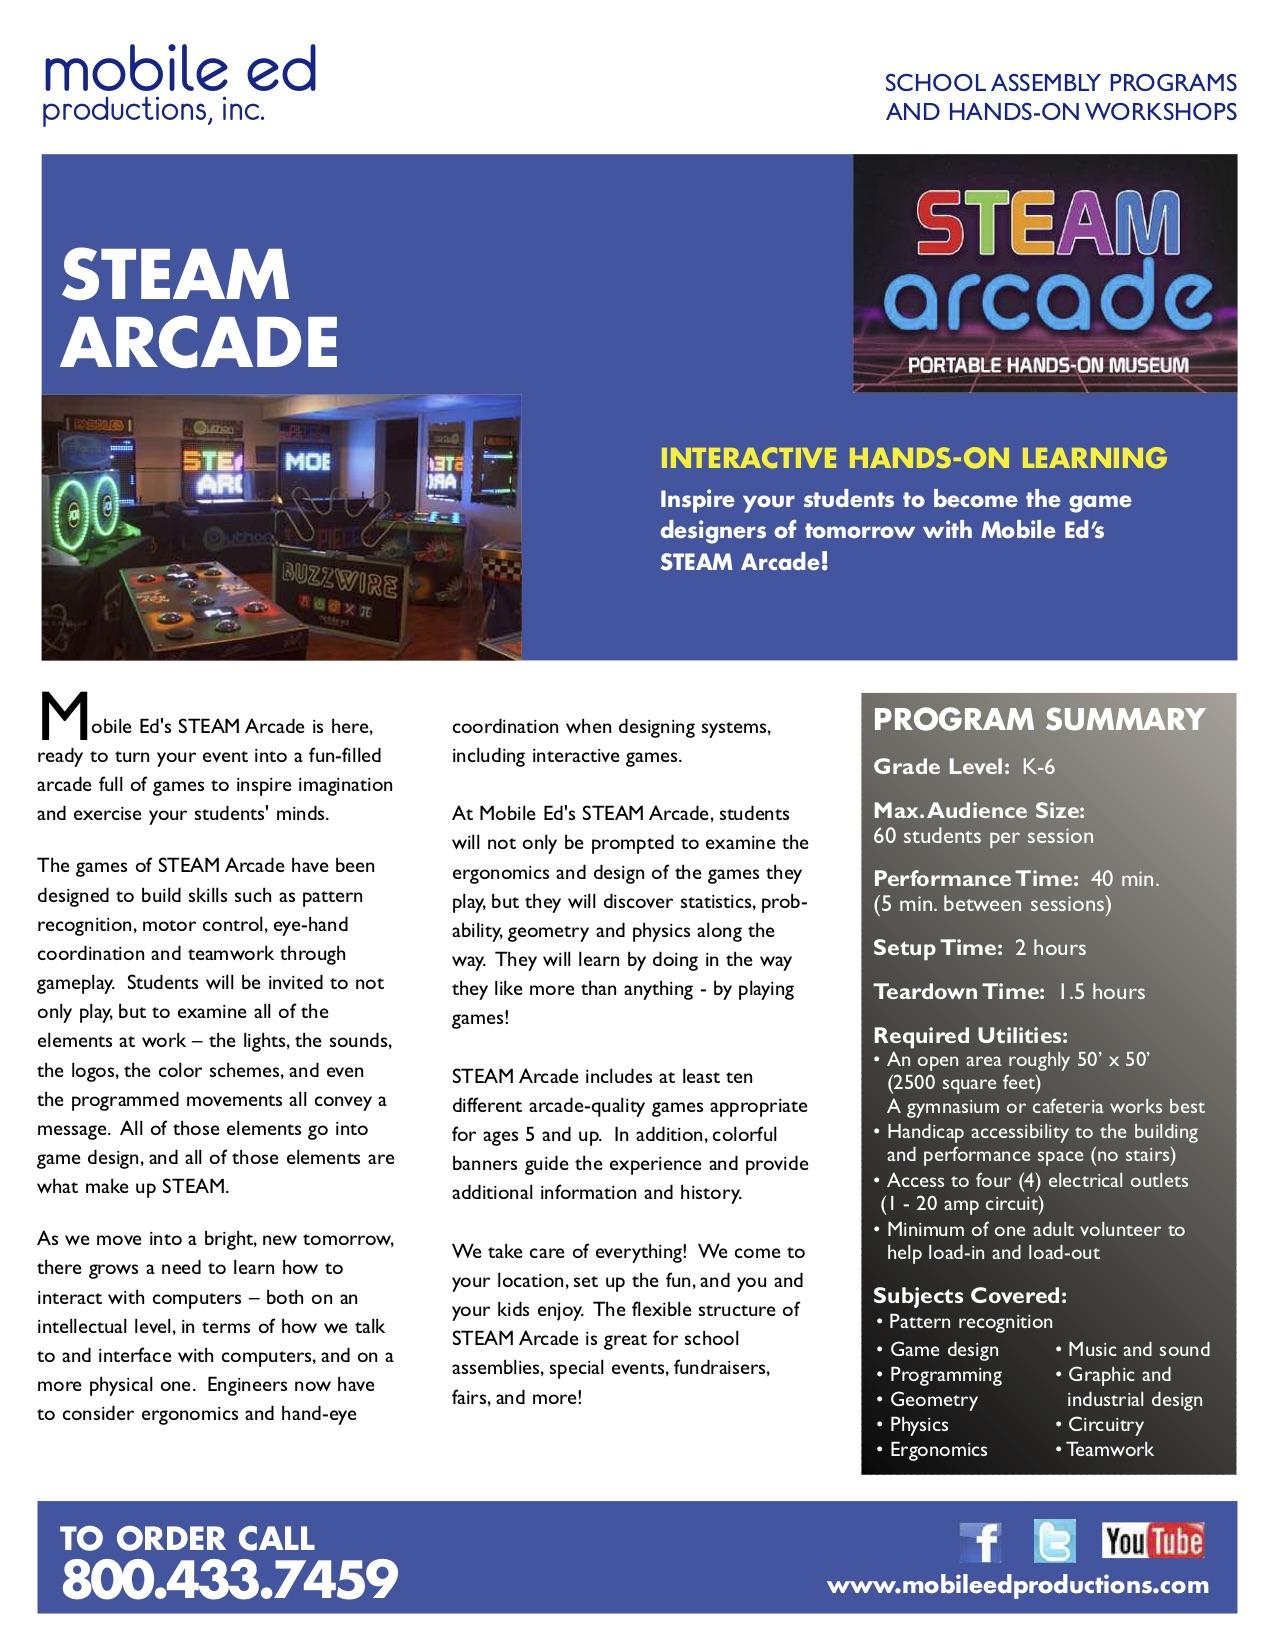 STEAM Arcade